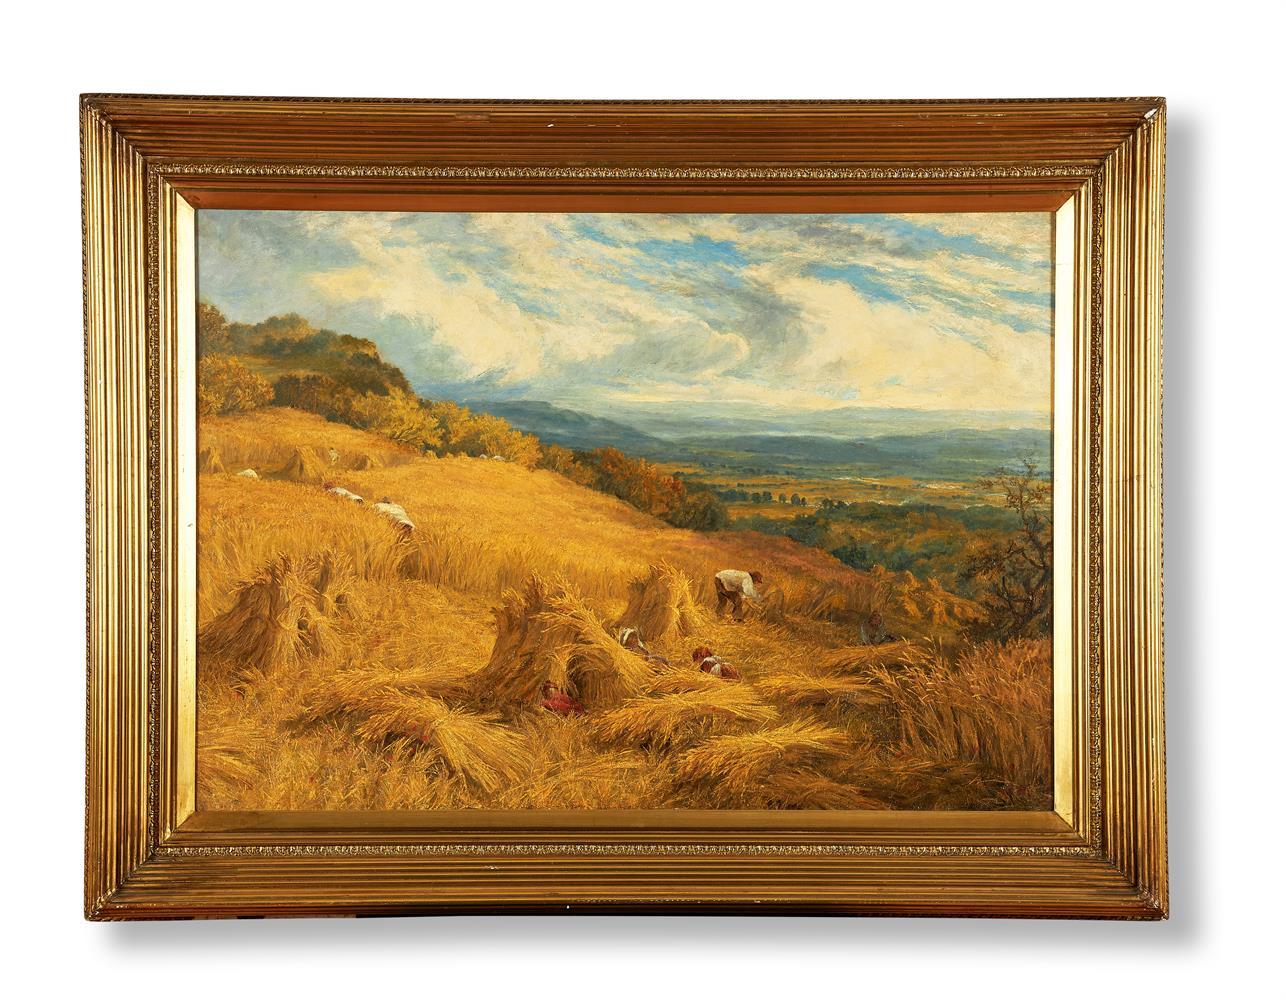 CIRCLE OF JOHN CLAYTON ADAMS (BRITISH 1840-1906), HARVESTING THE CORN